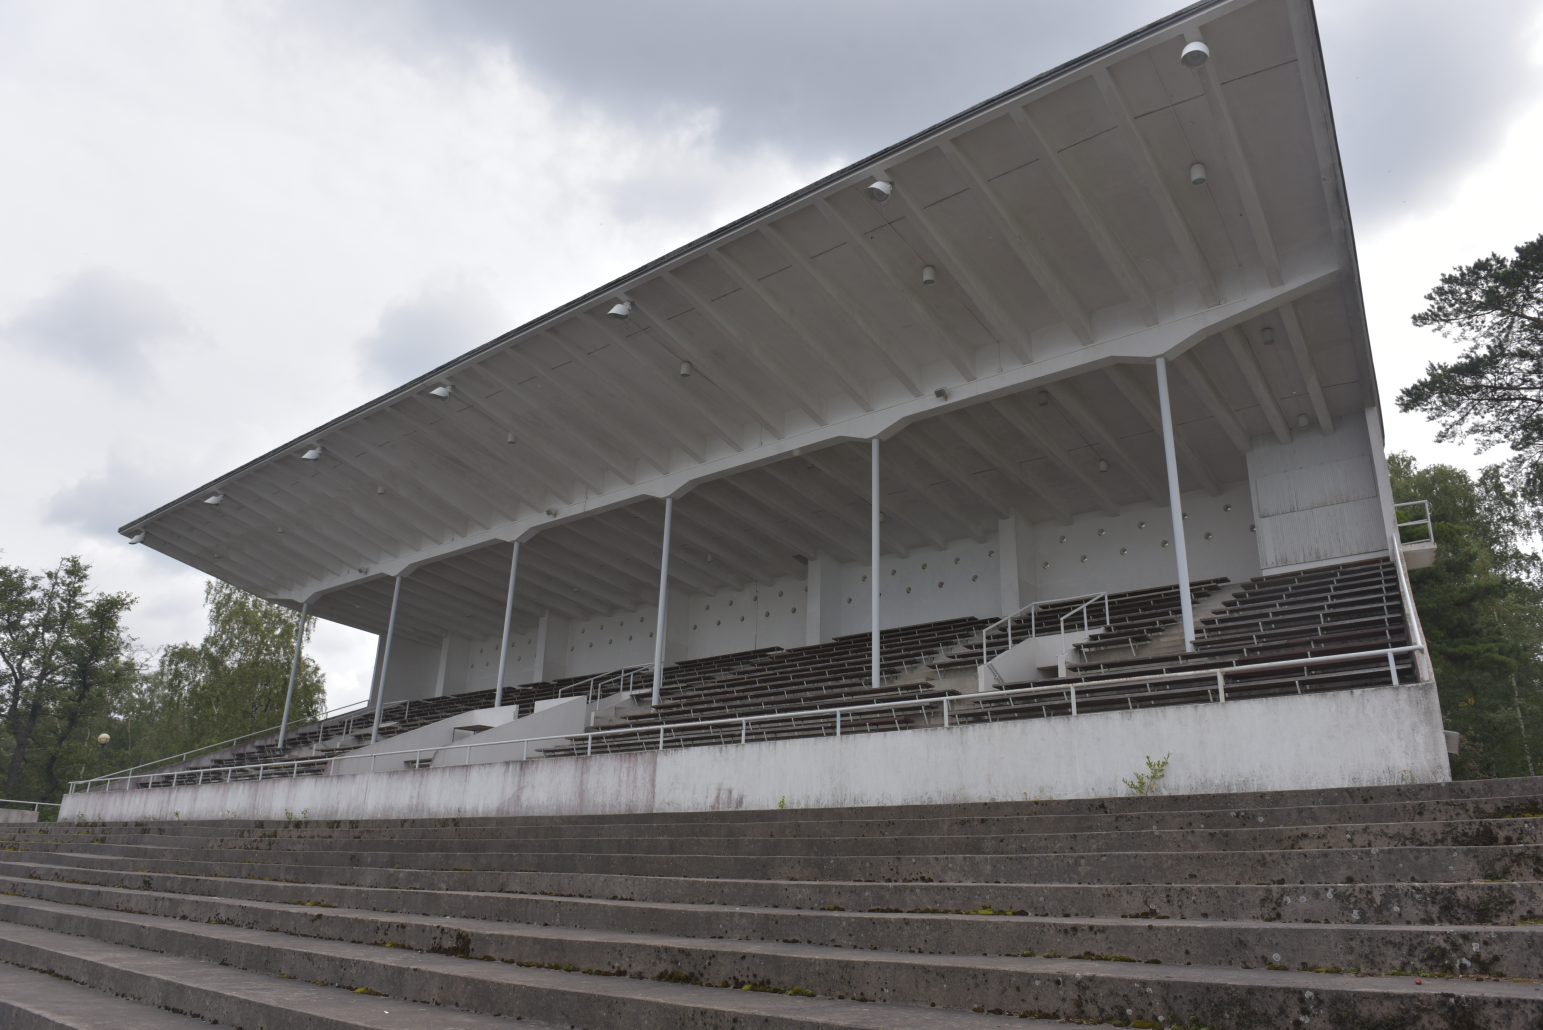 Soutustadion Helsinki